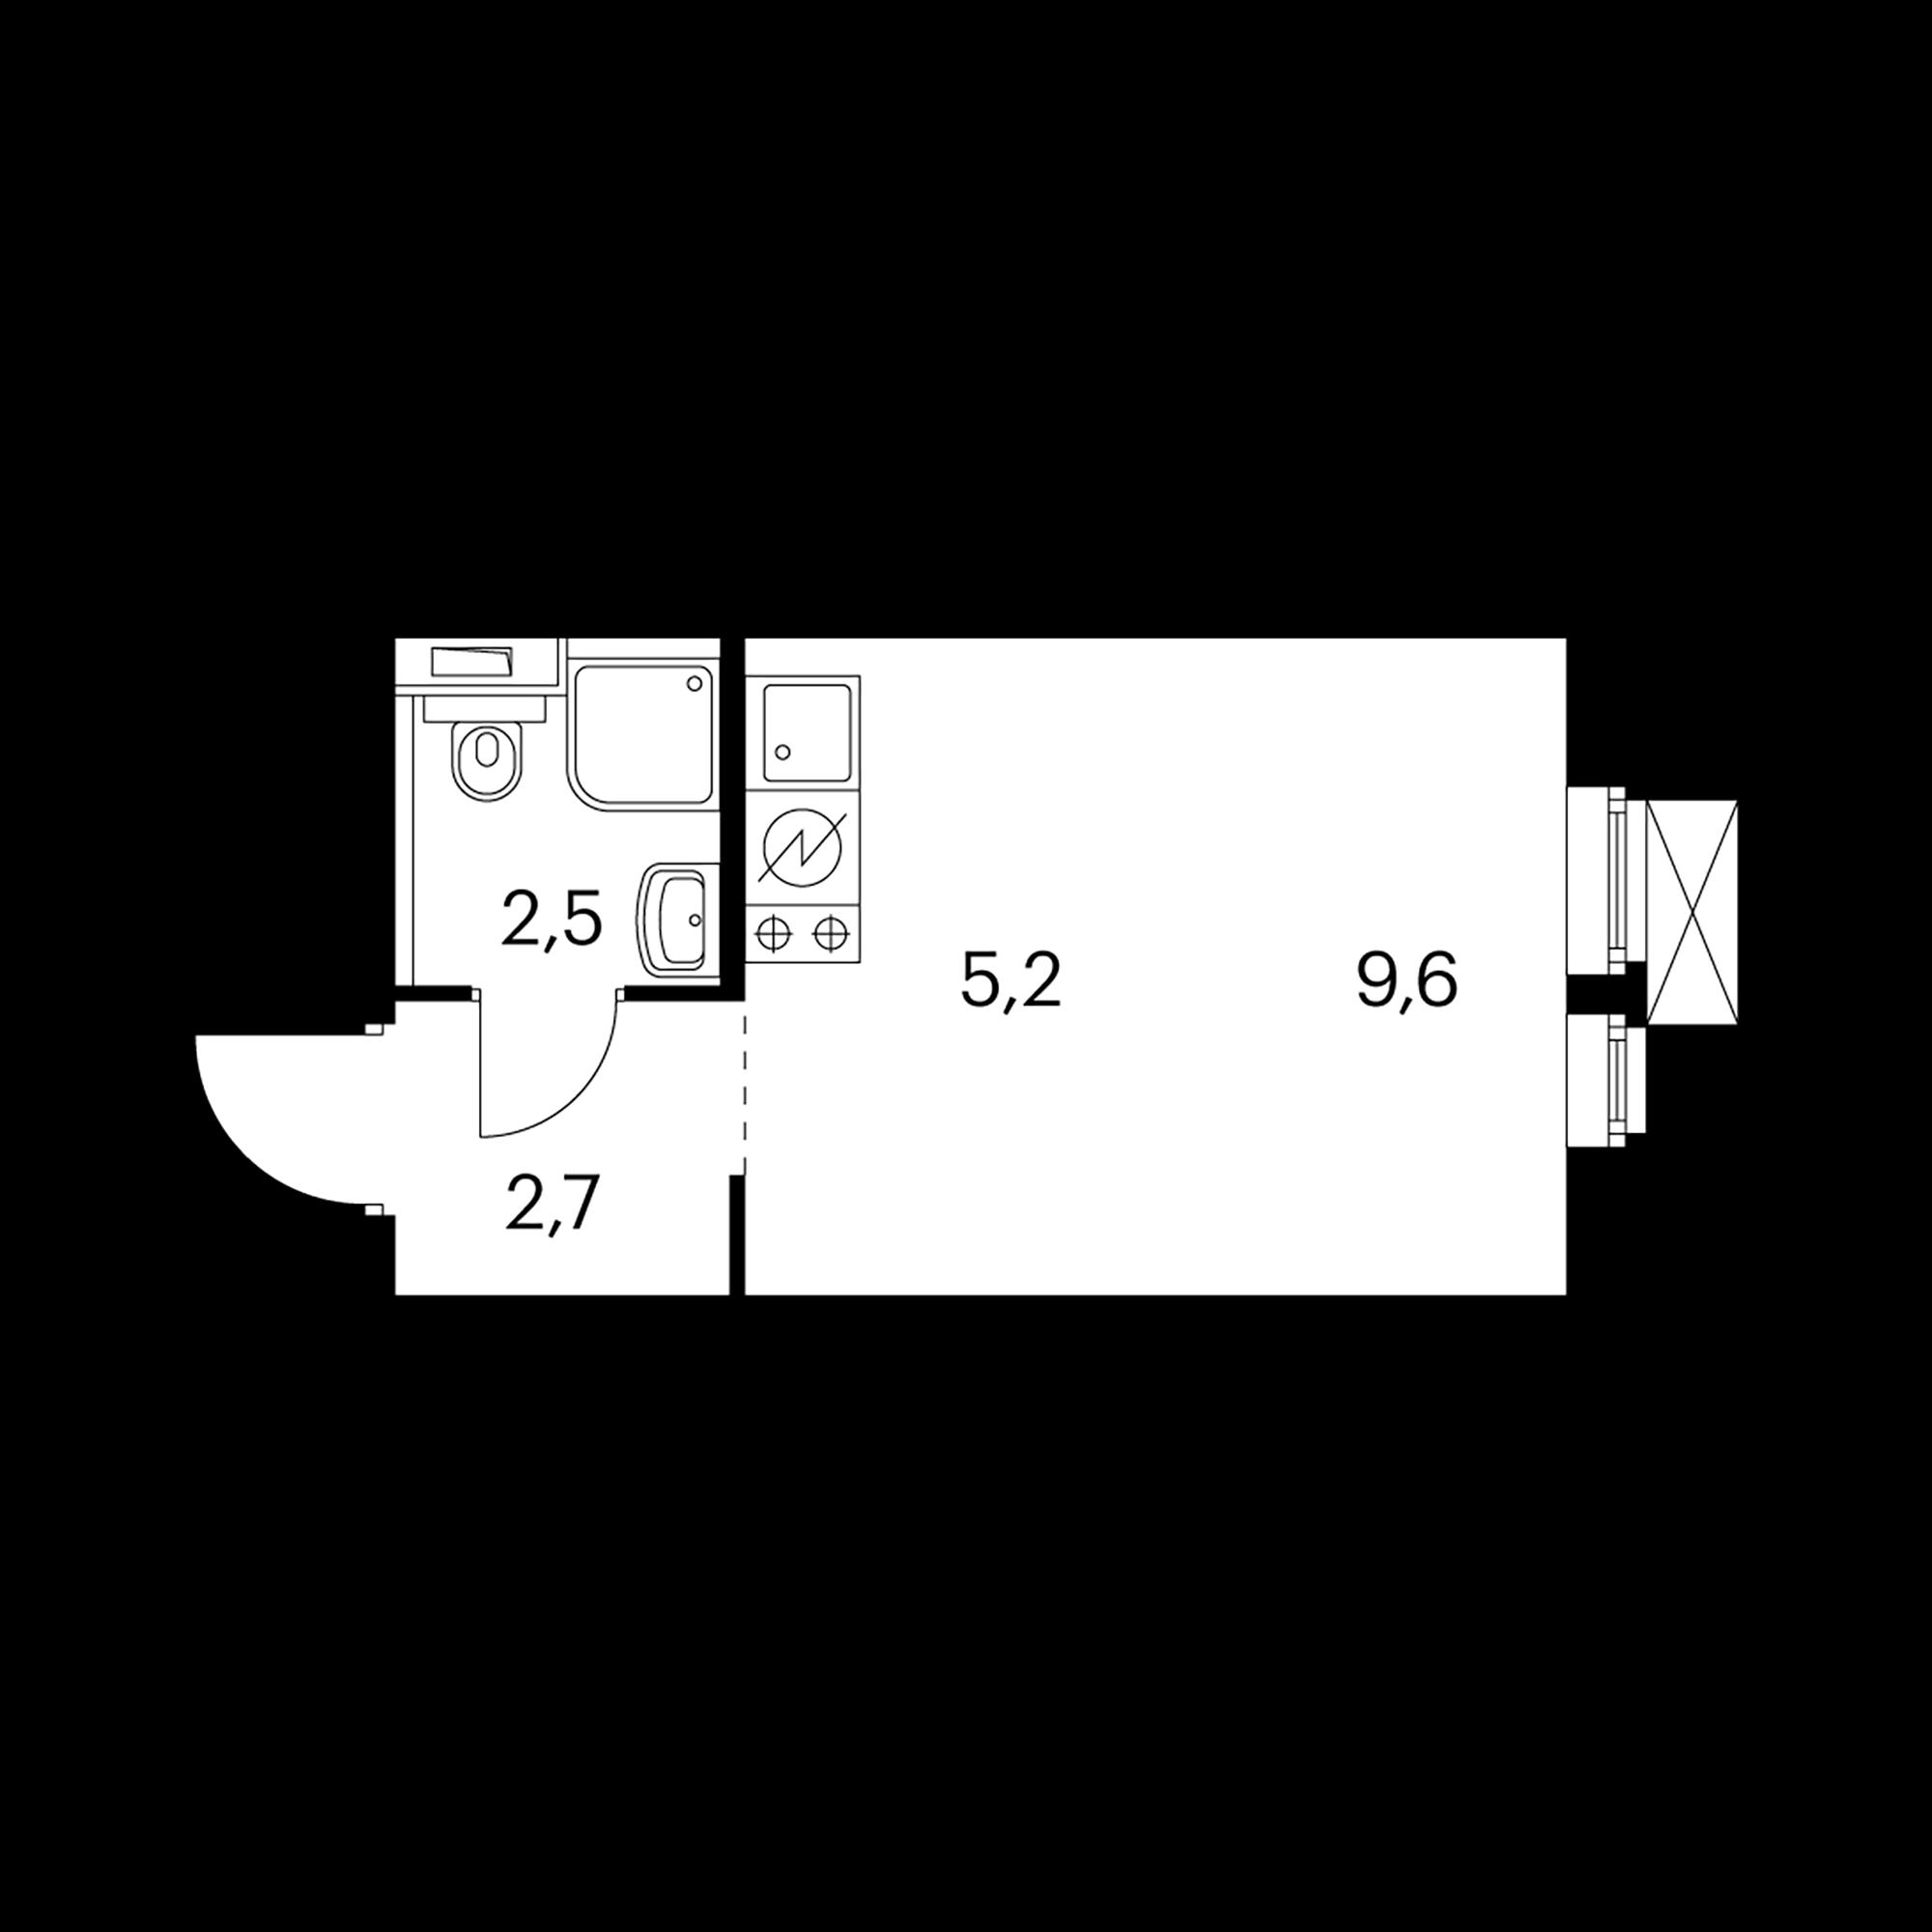 1NS1_3.6-3*